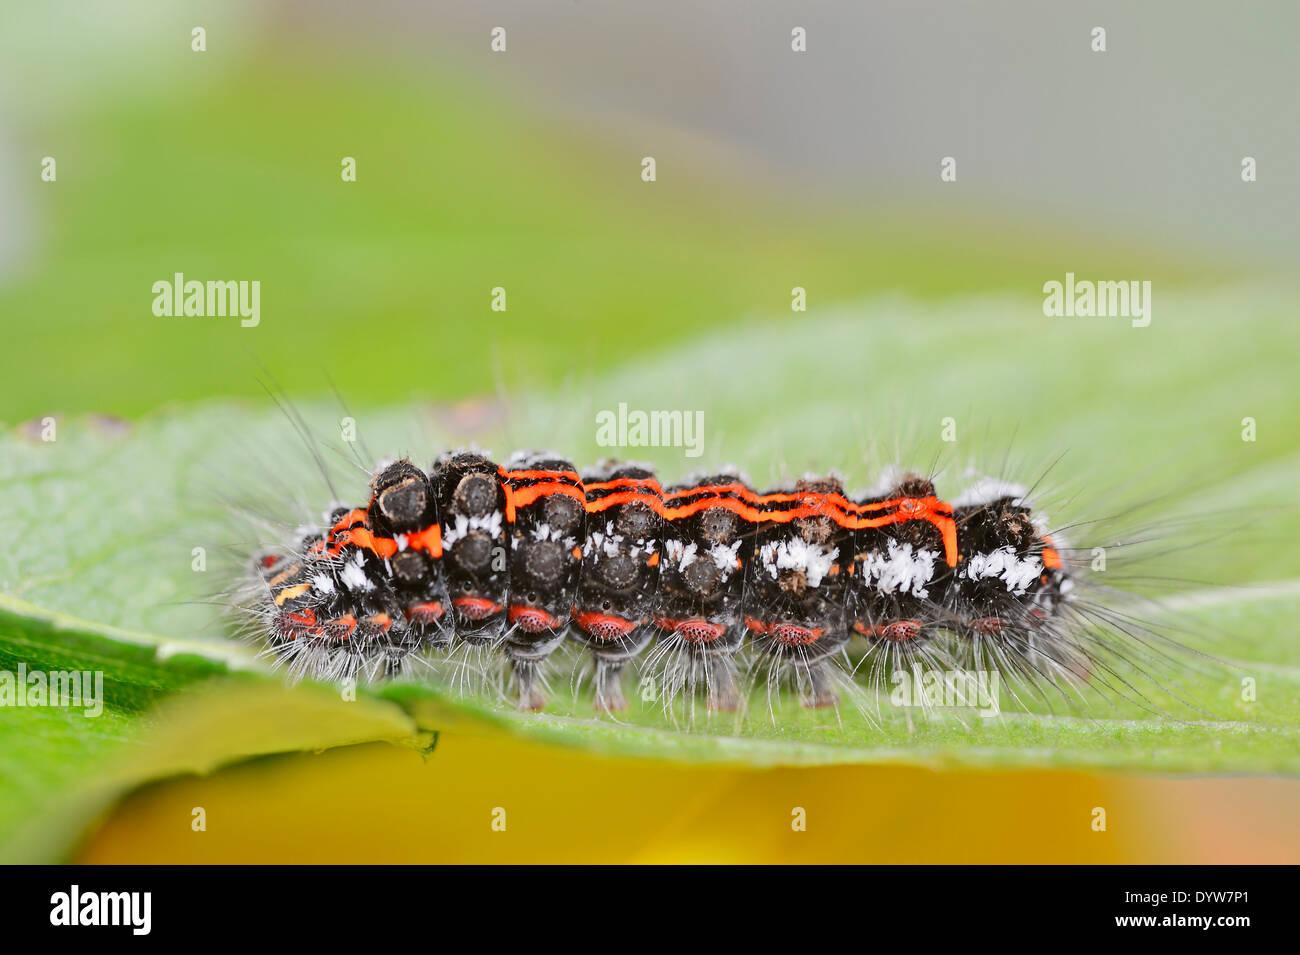 La Polilla de cola amarilla, Polilla Goldtail o Swan (polilla Euproctis similis), Caterpillar, Renania del Norte Foto de stock